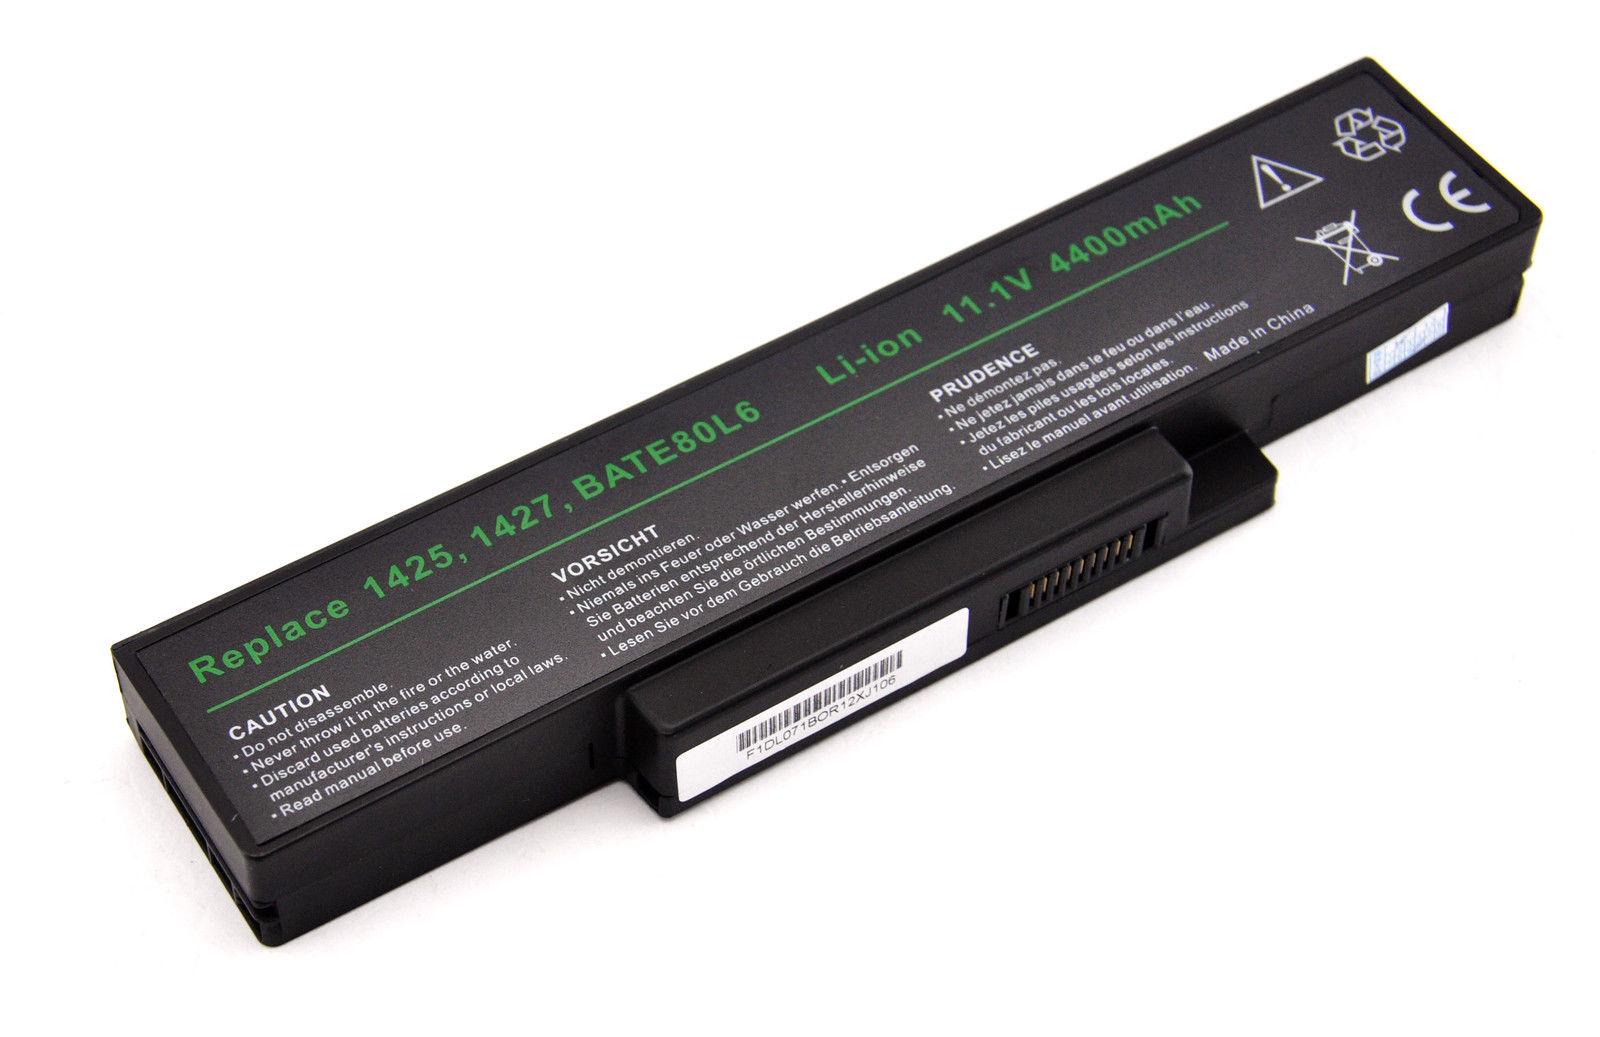 Dell BATFT10L61 11.1V 4400mAh Replacement Laptop Battery